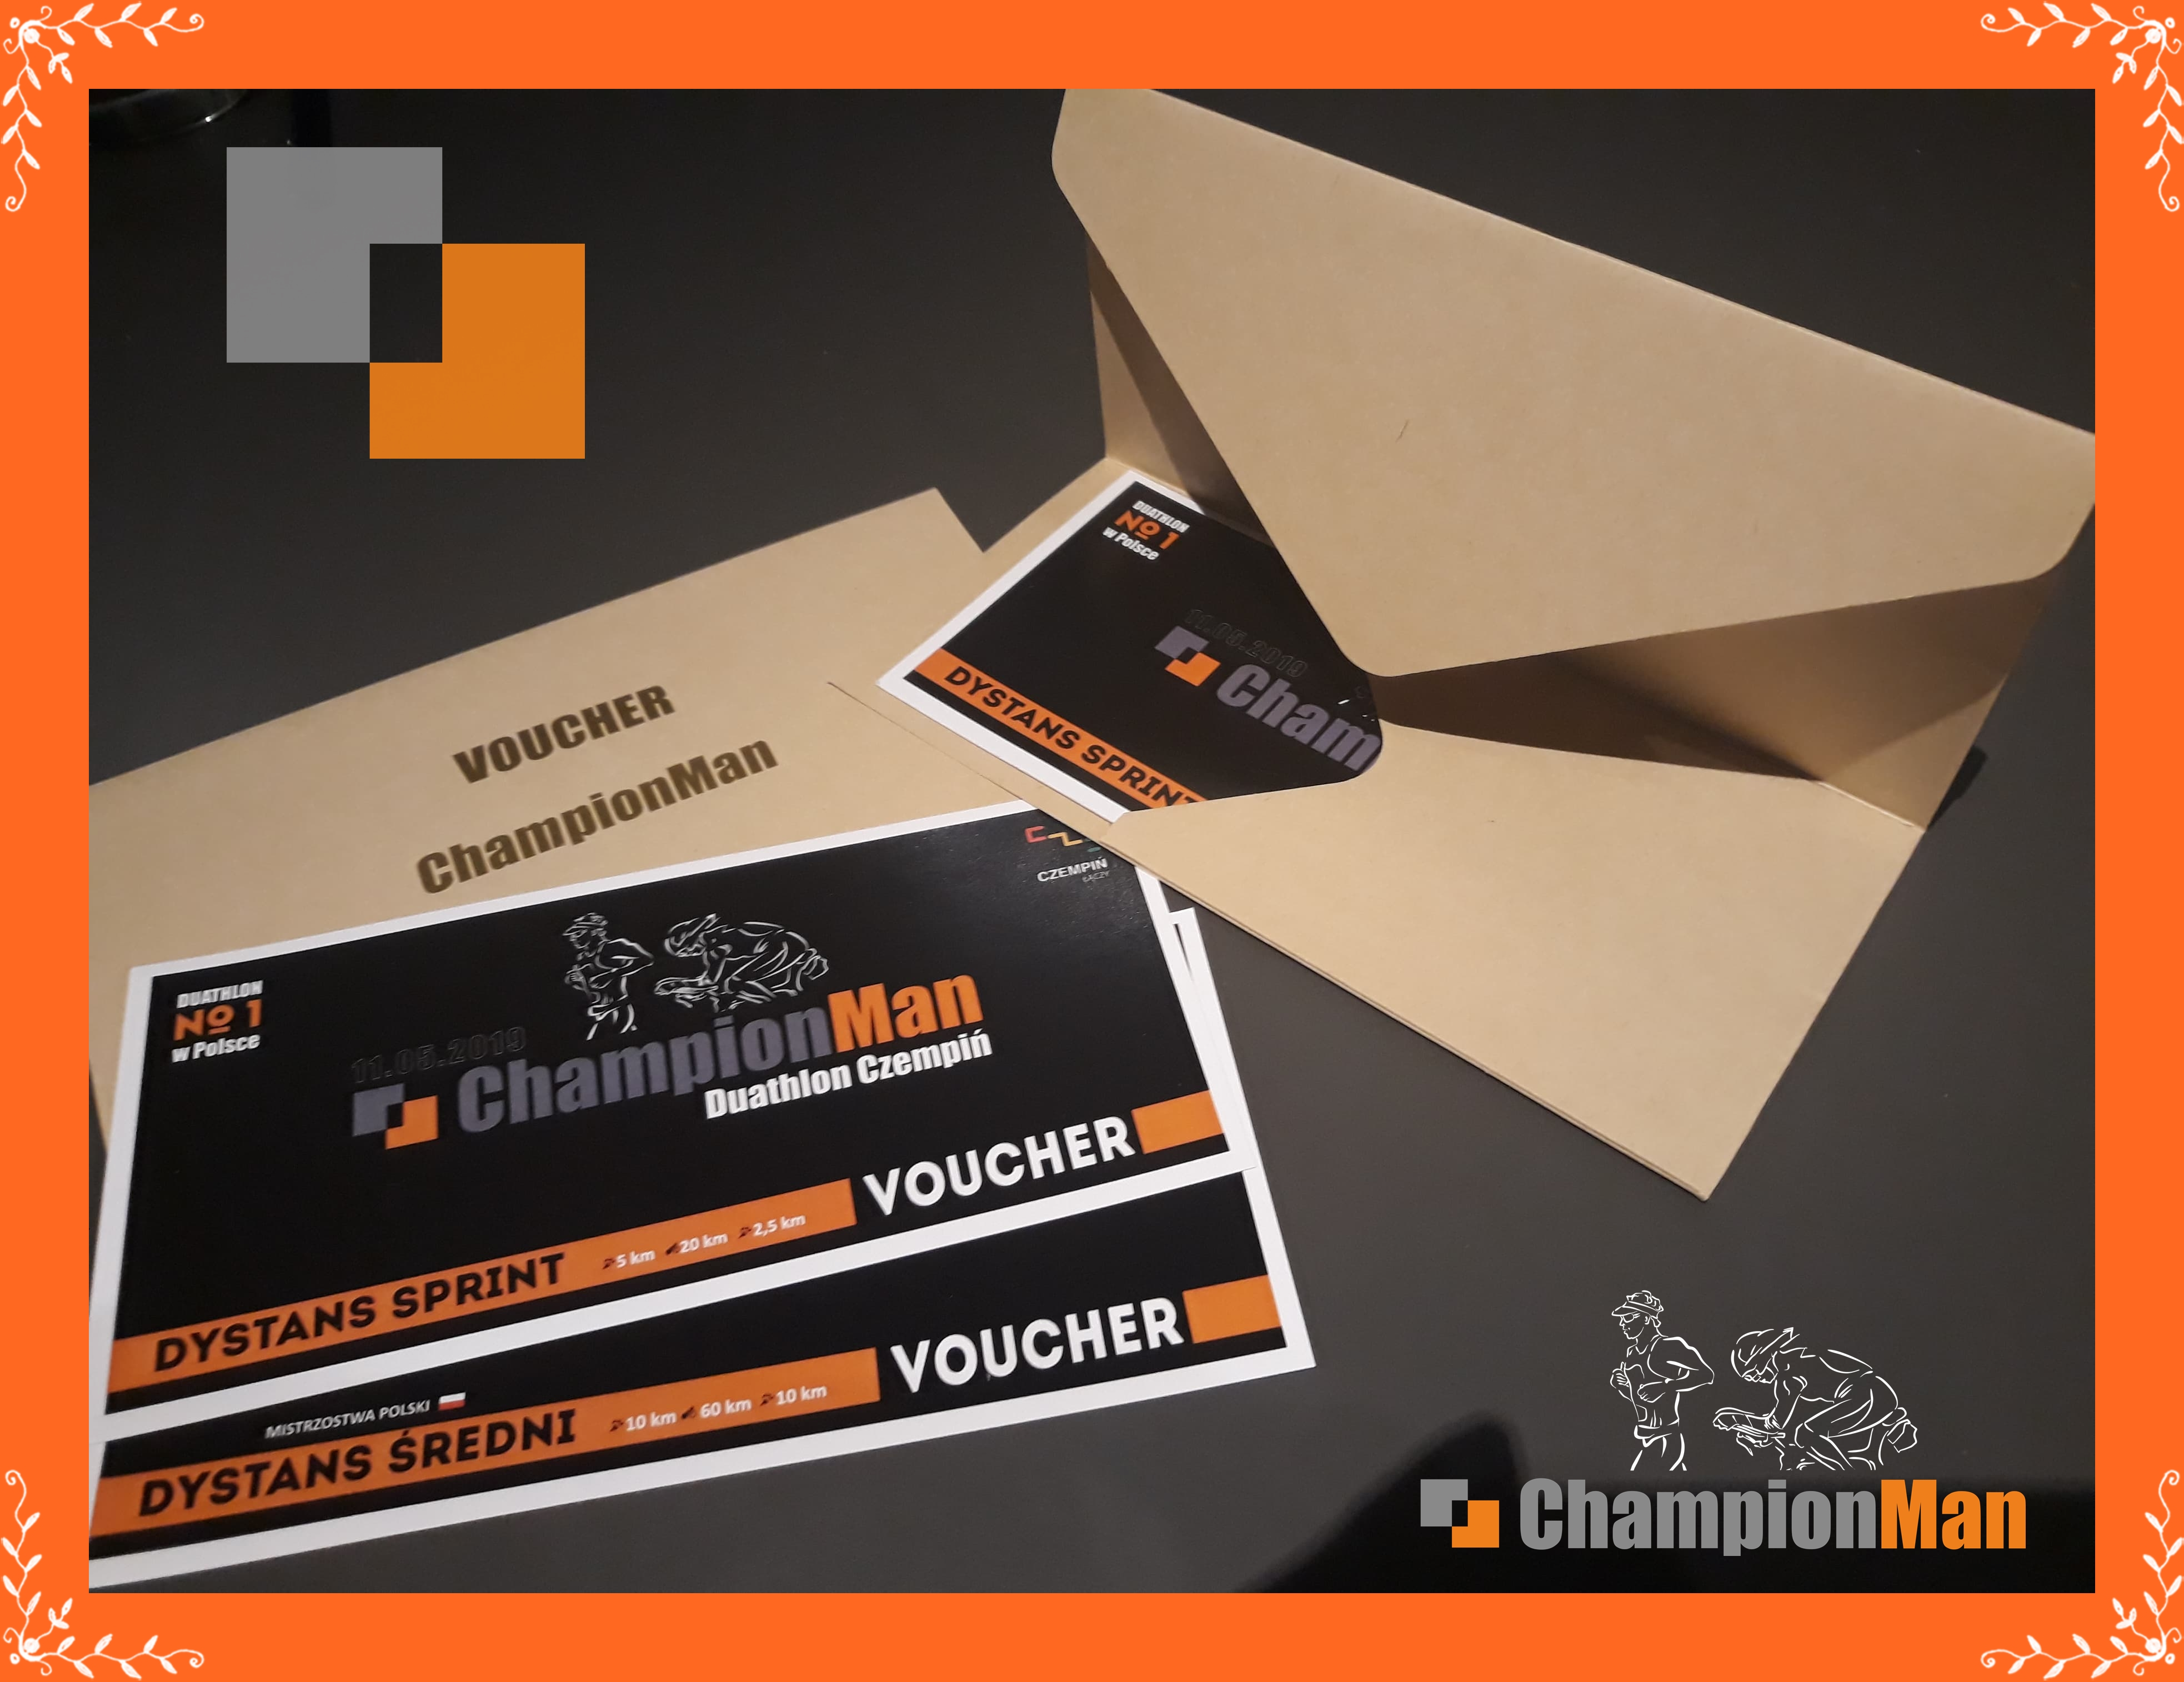 Voucher Championman na www